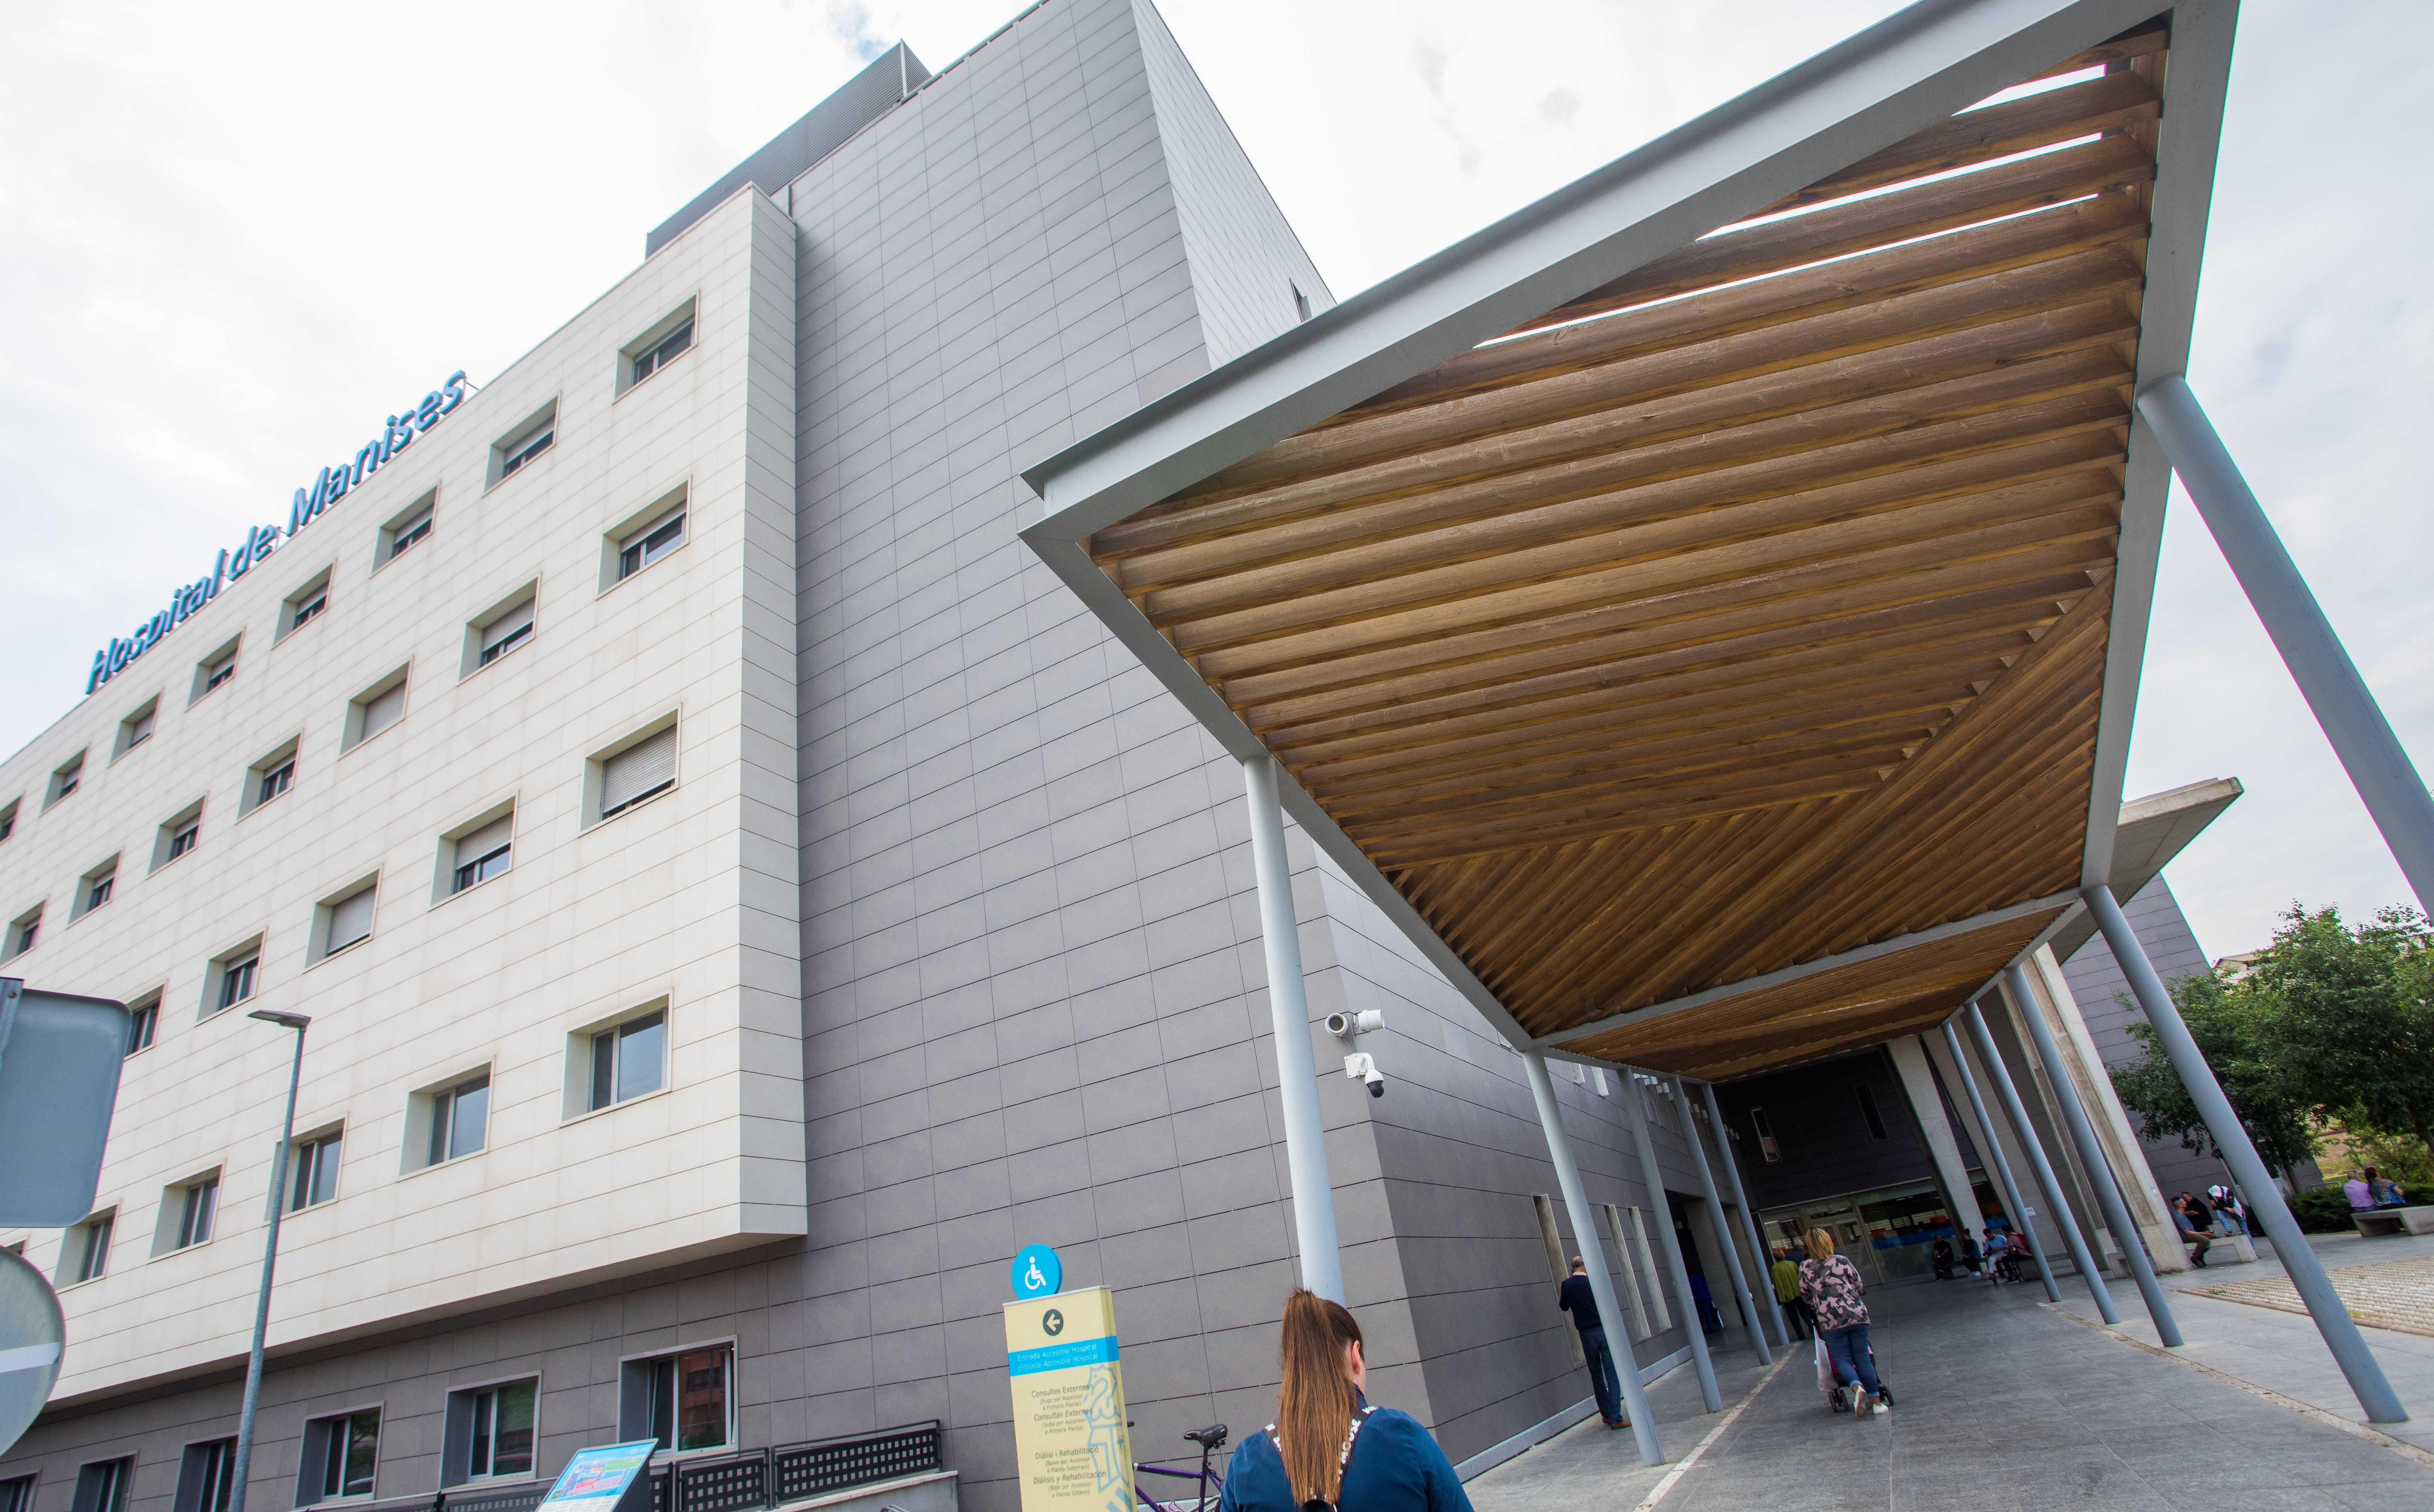 HospitalManises19